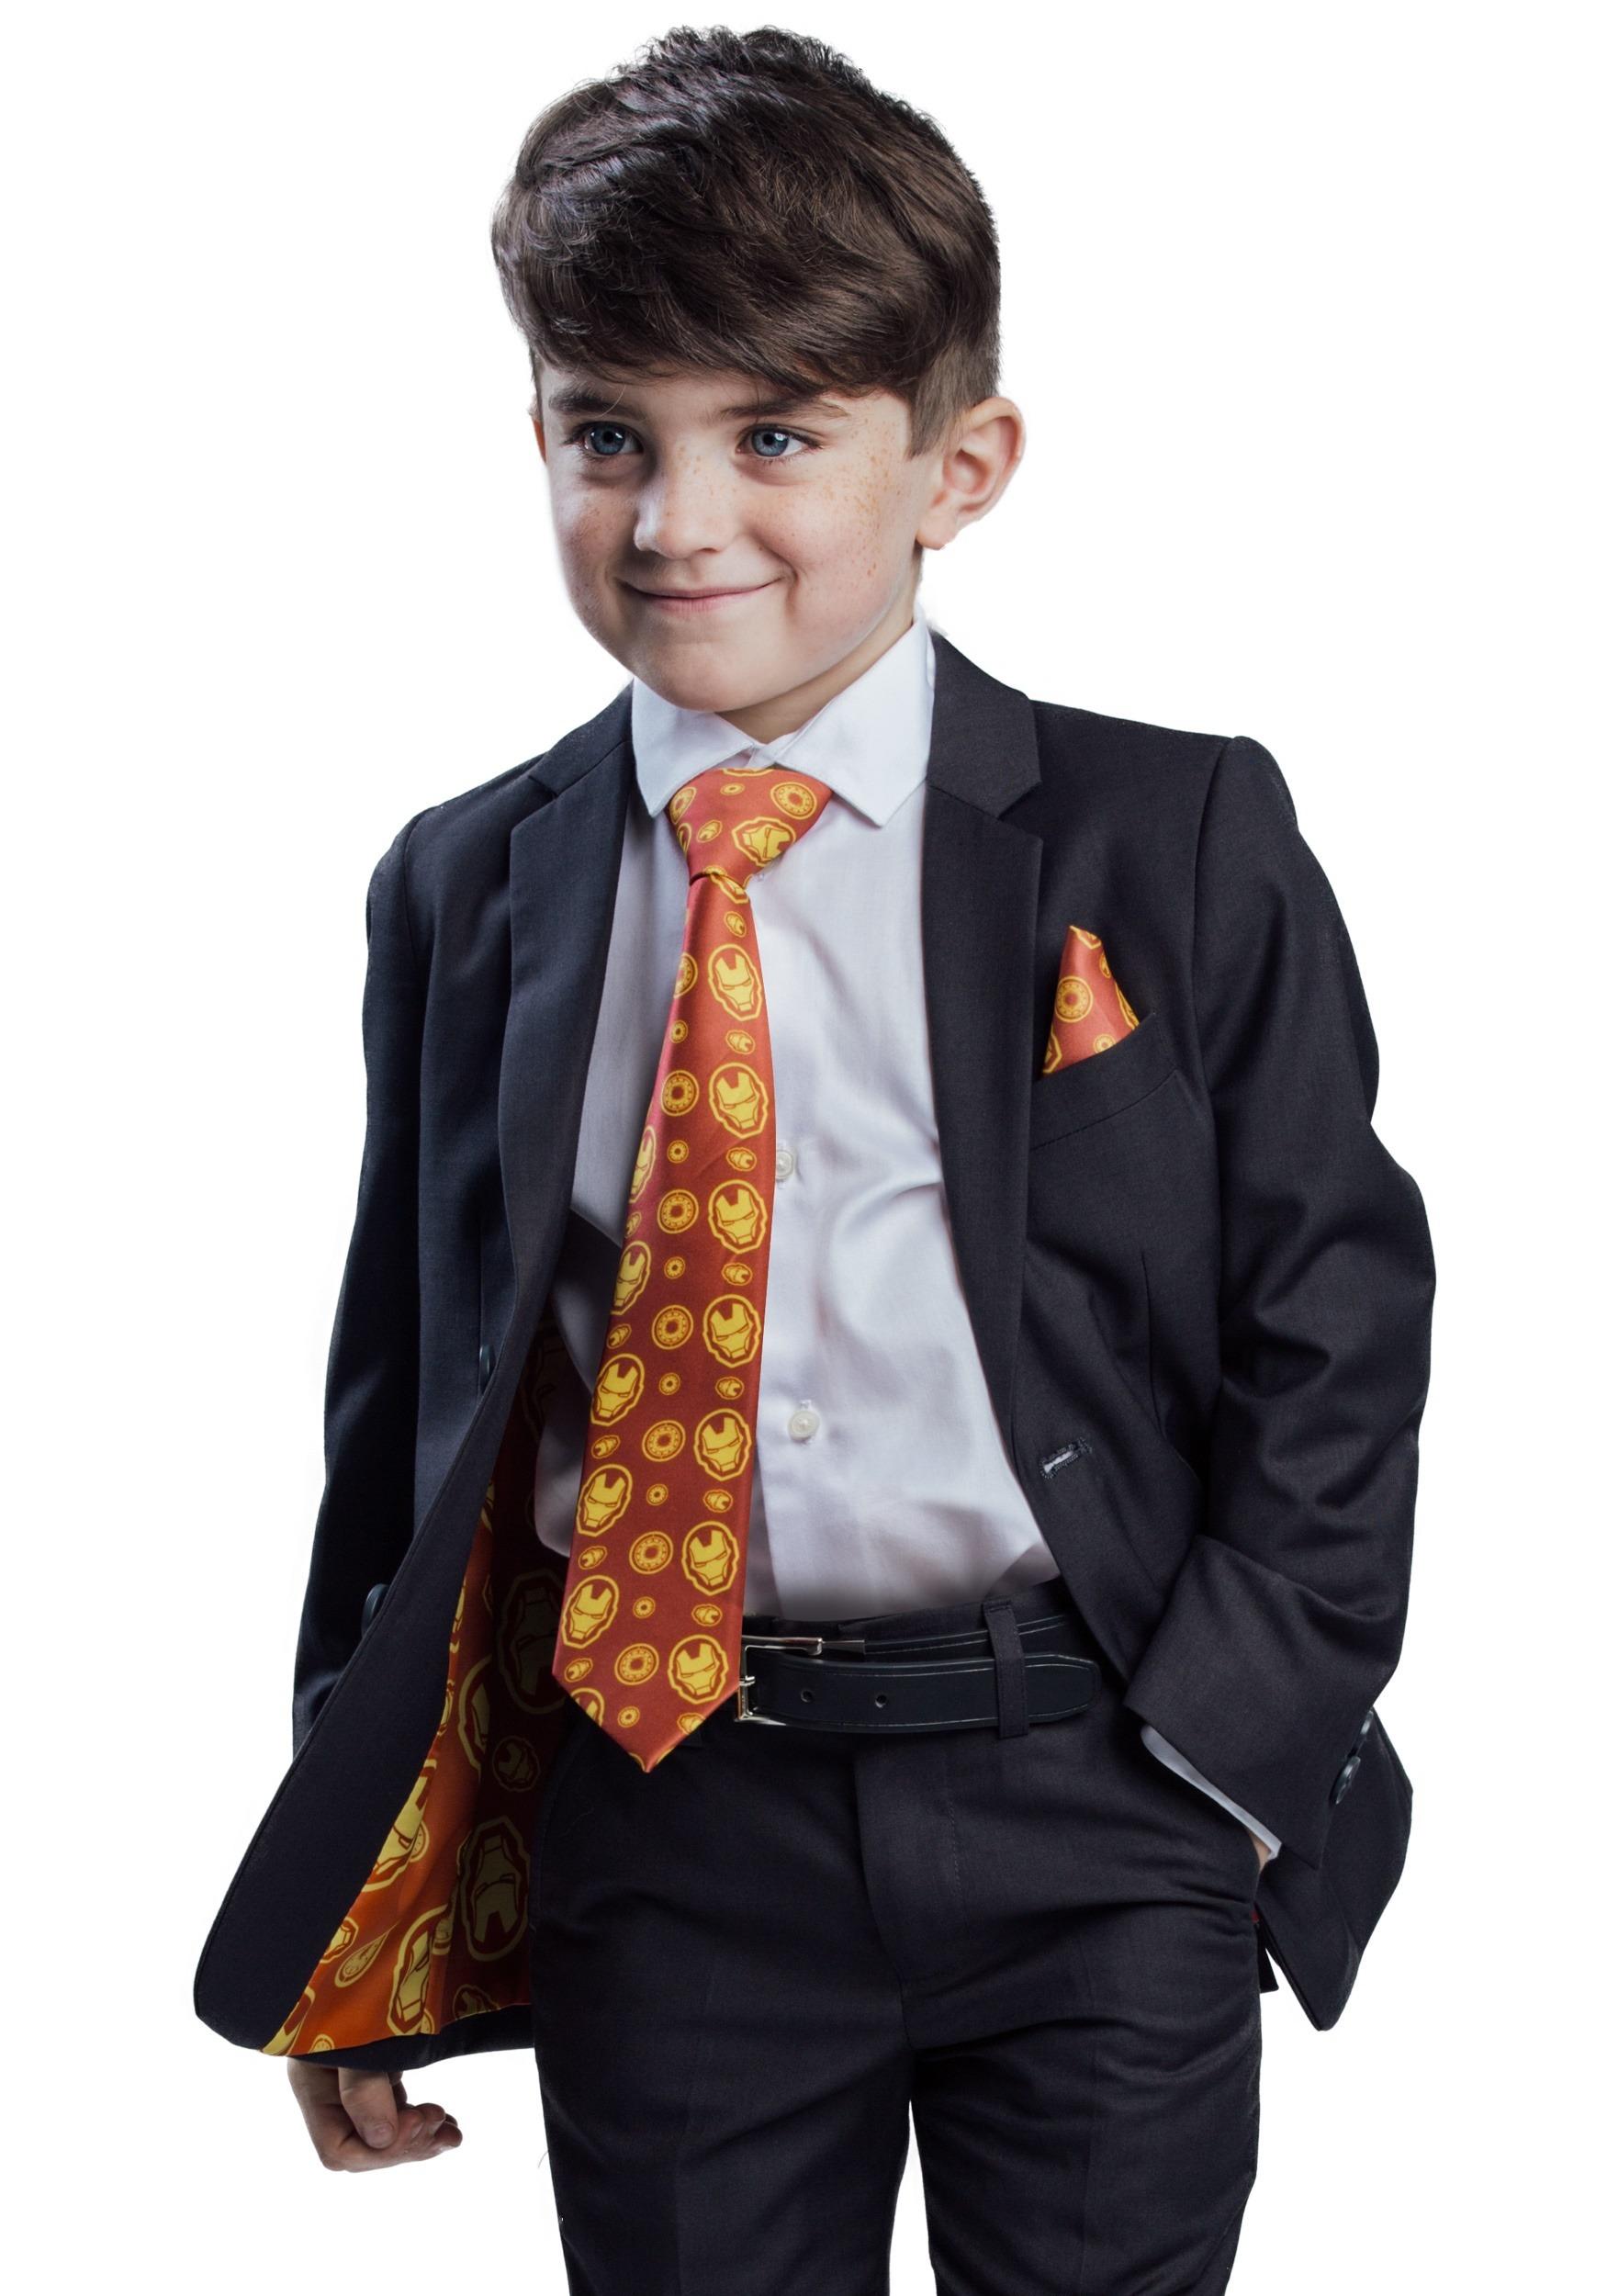 Kids Iron Man Suit (Secret Identity) - Charcoal FUN9024CH